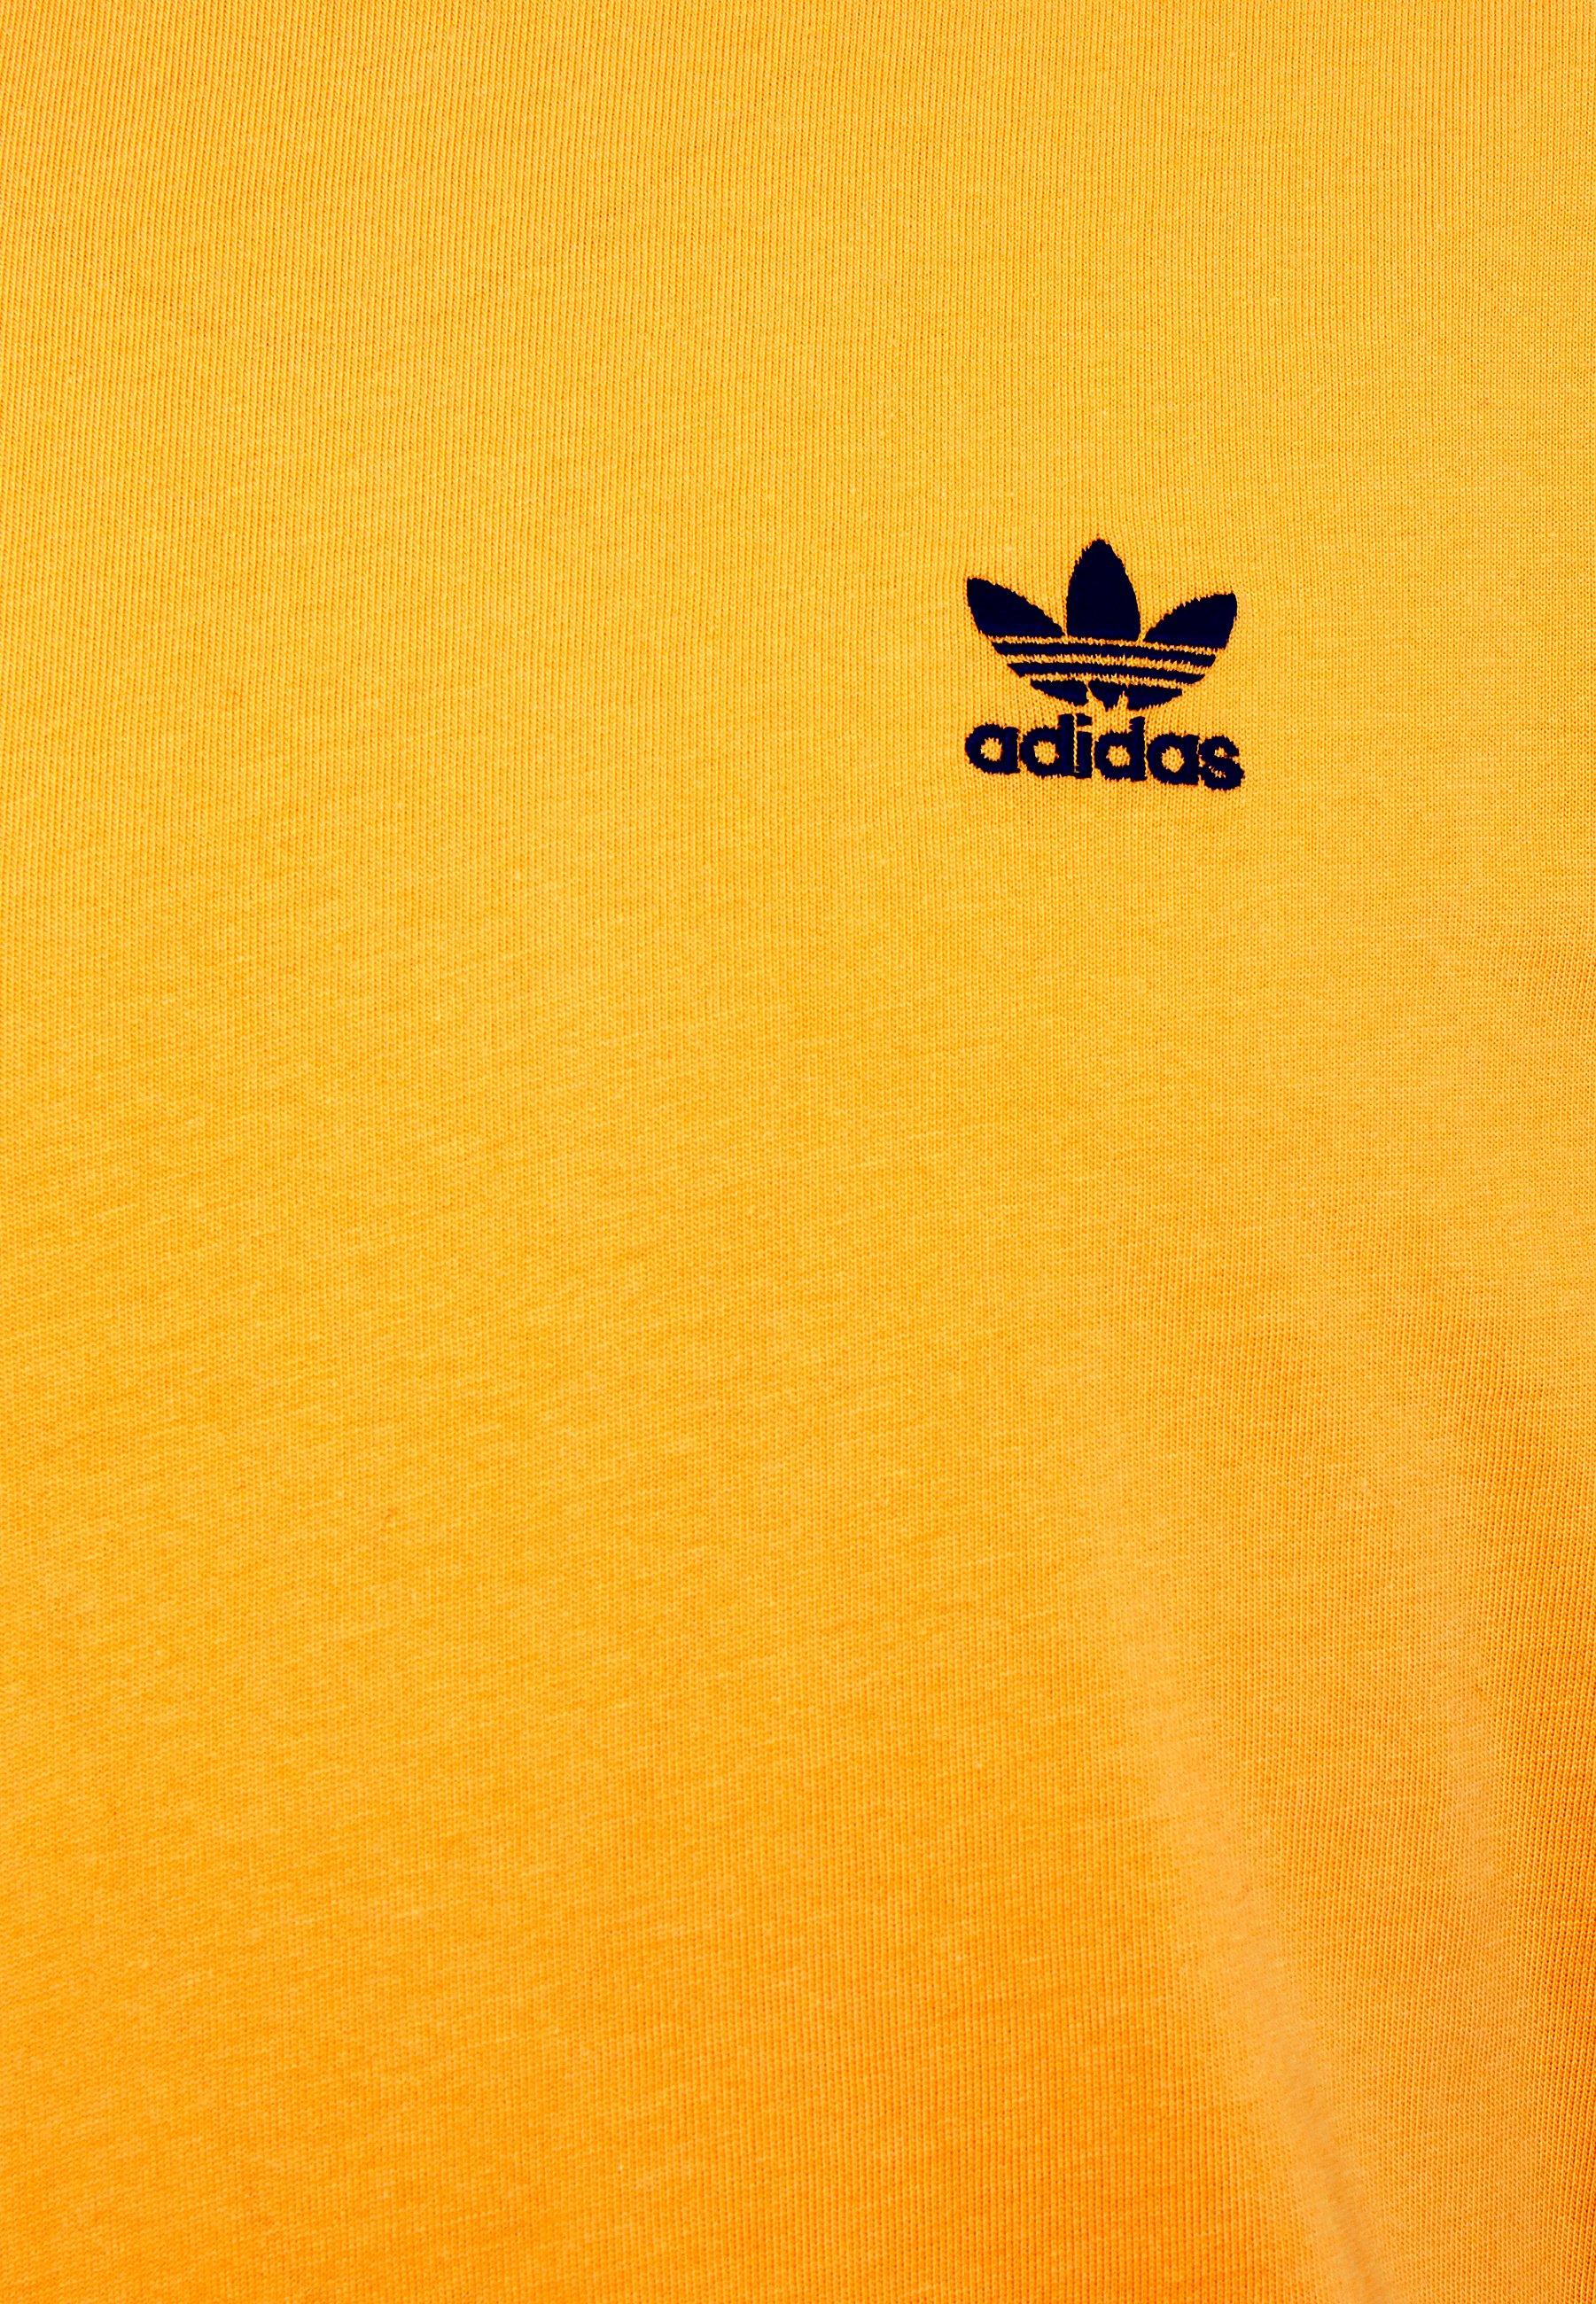 Adidas Originals Trefoil Tee - T-shirts Med Print Actgol/black/gul